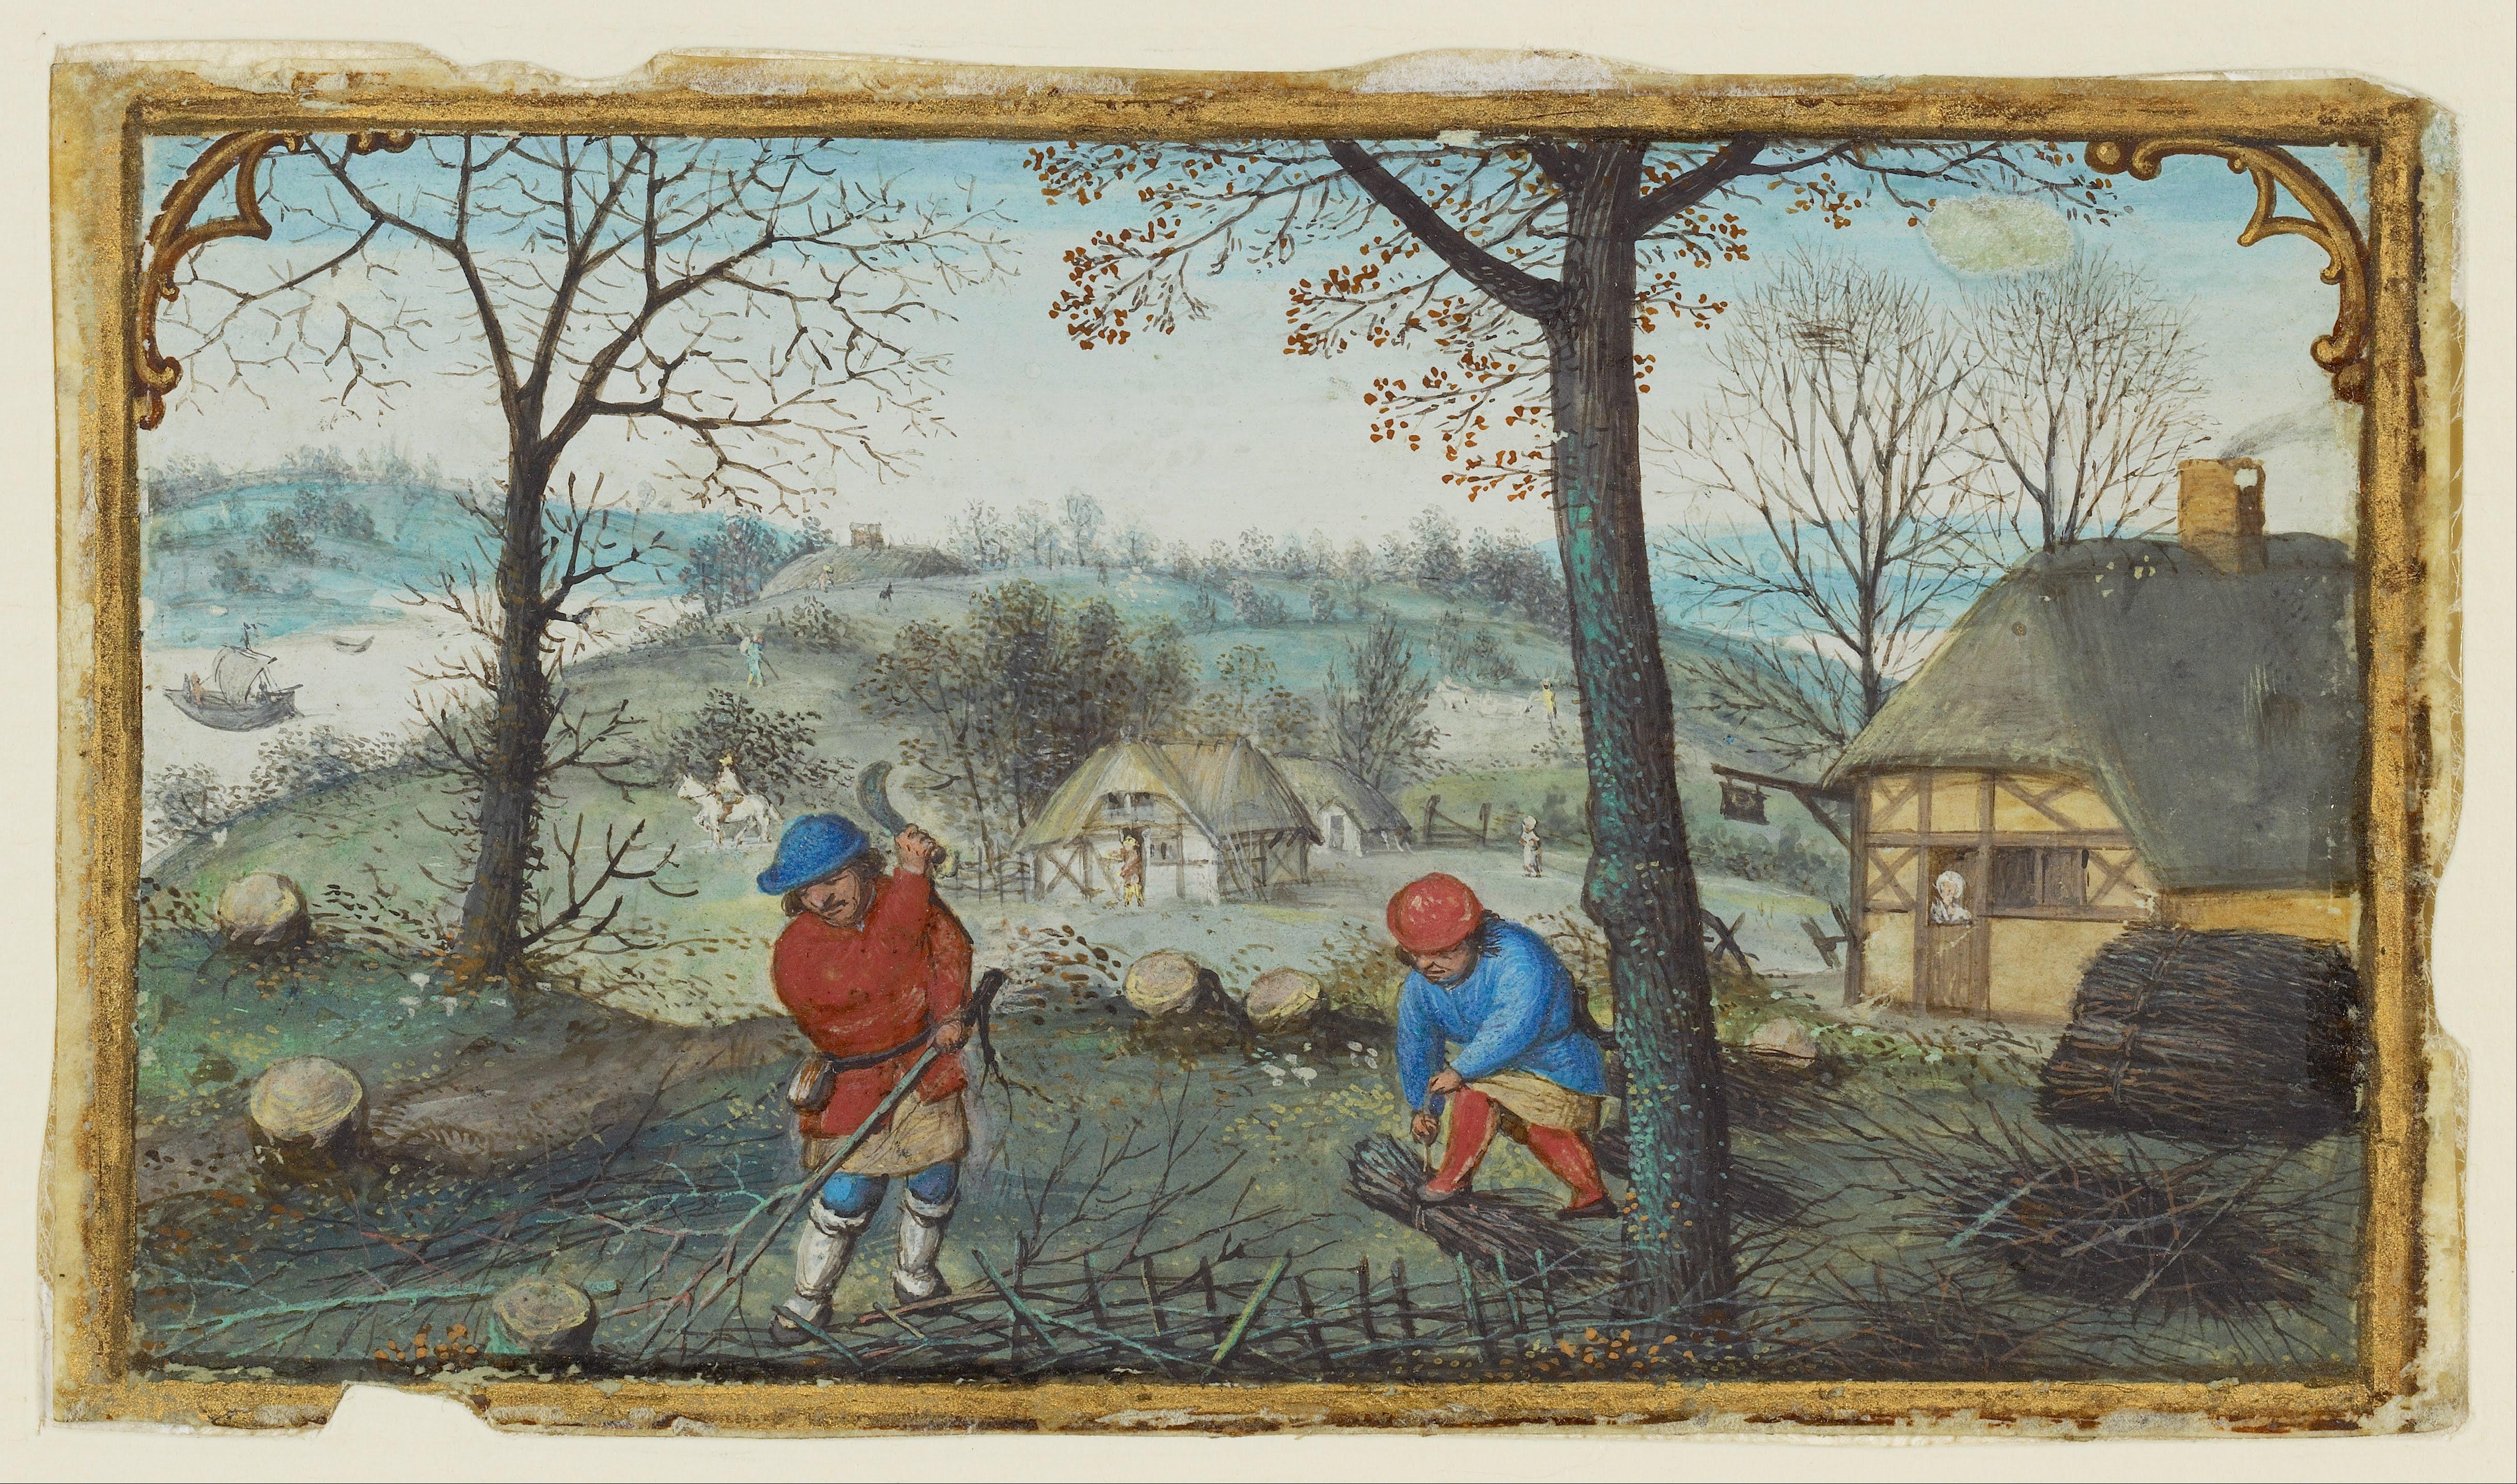 ... Flemish - Gathering Twigs - Google Art Project.jpg - Wikimedia Commons